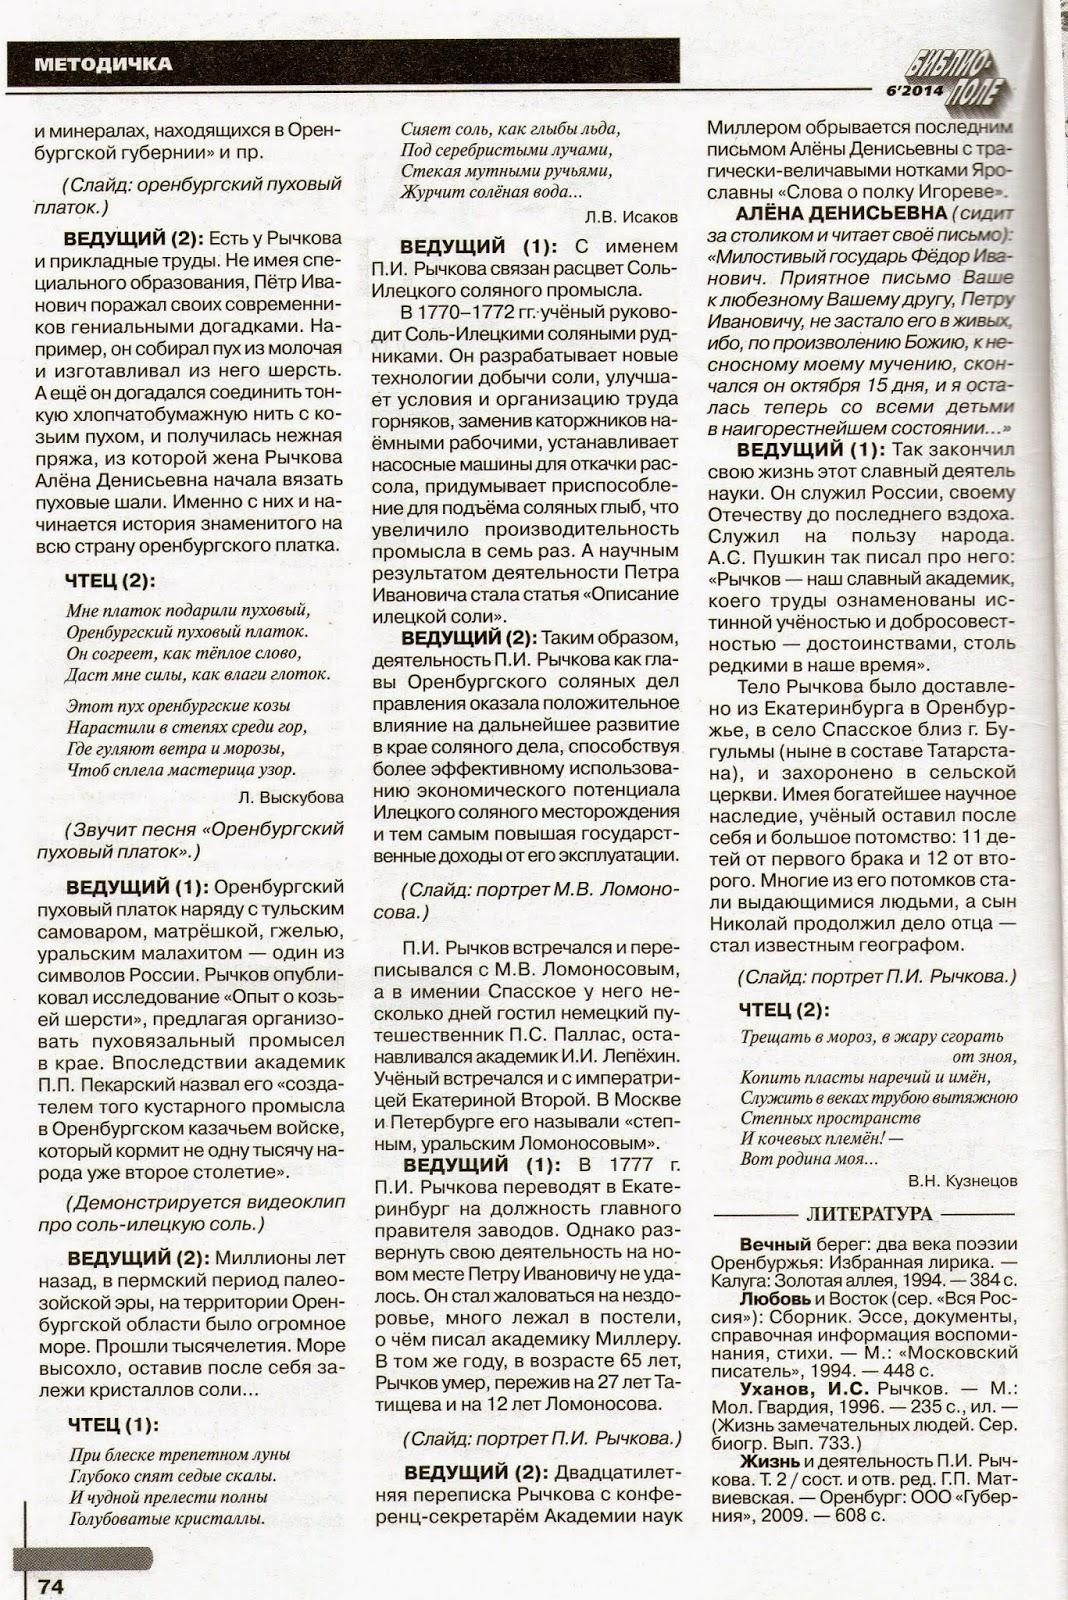 журнал библиополе,2013,№3